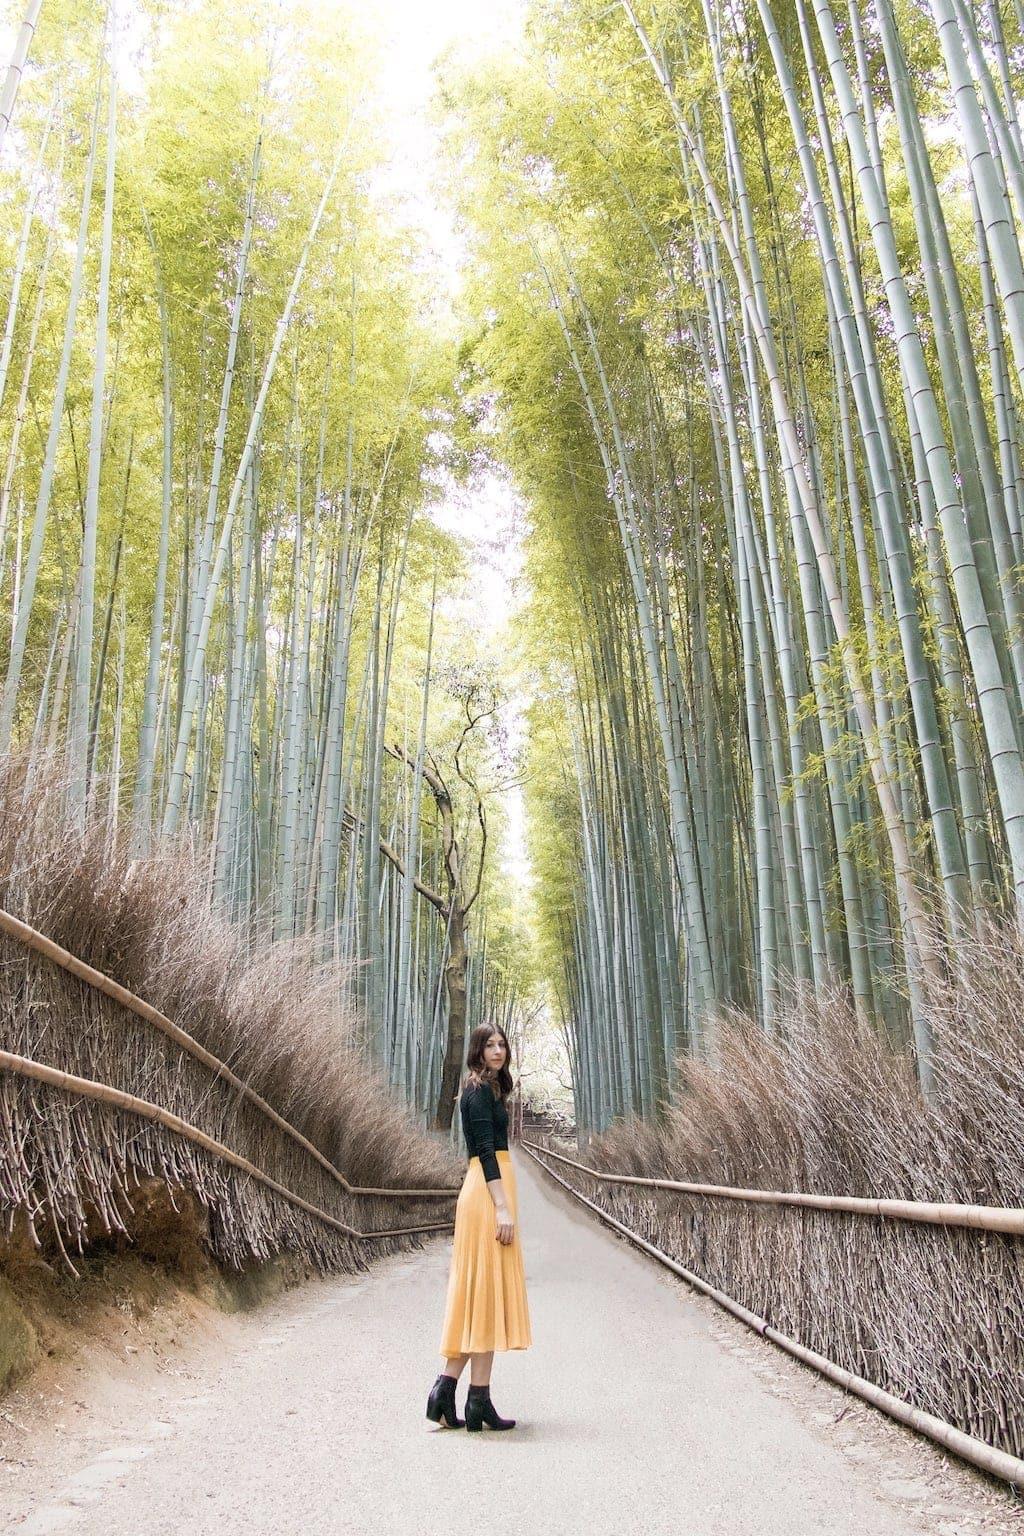 Kyoto Travel Guide: Arashiyama Bamboo Forest